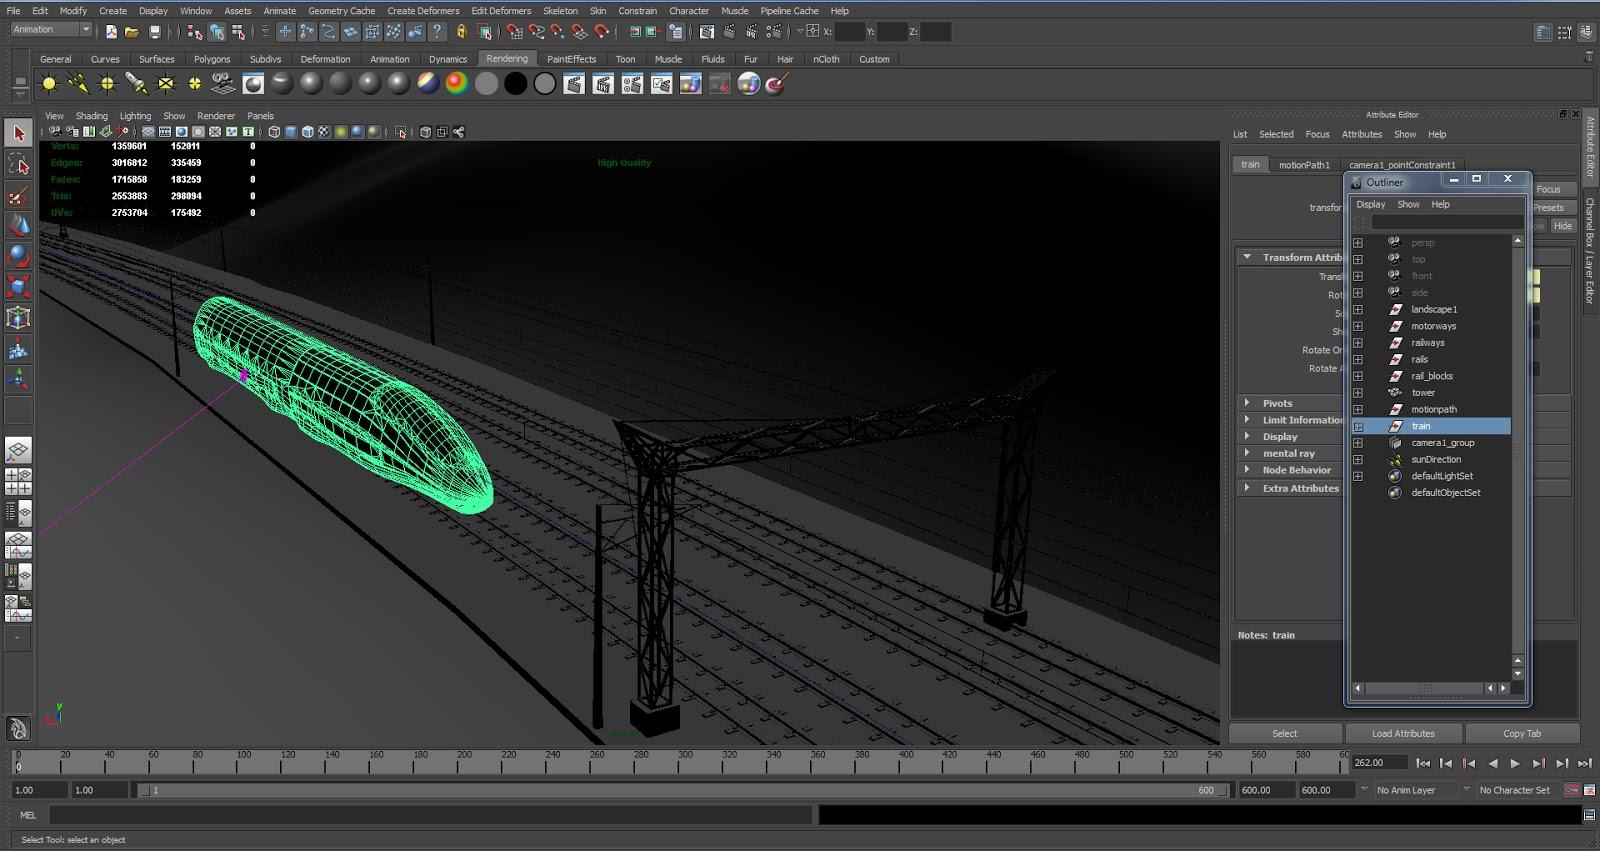 Cloud Stitch Studio: Movie update - Modeling